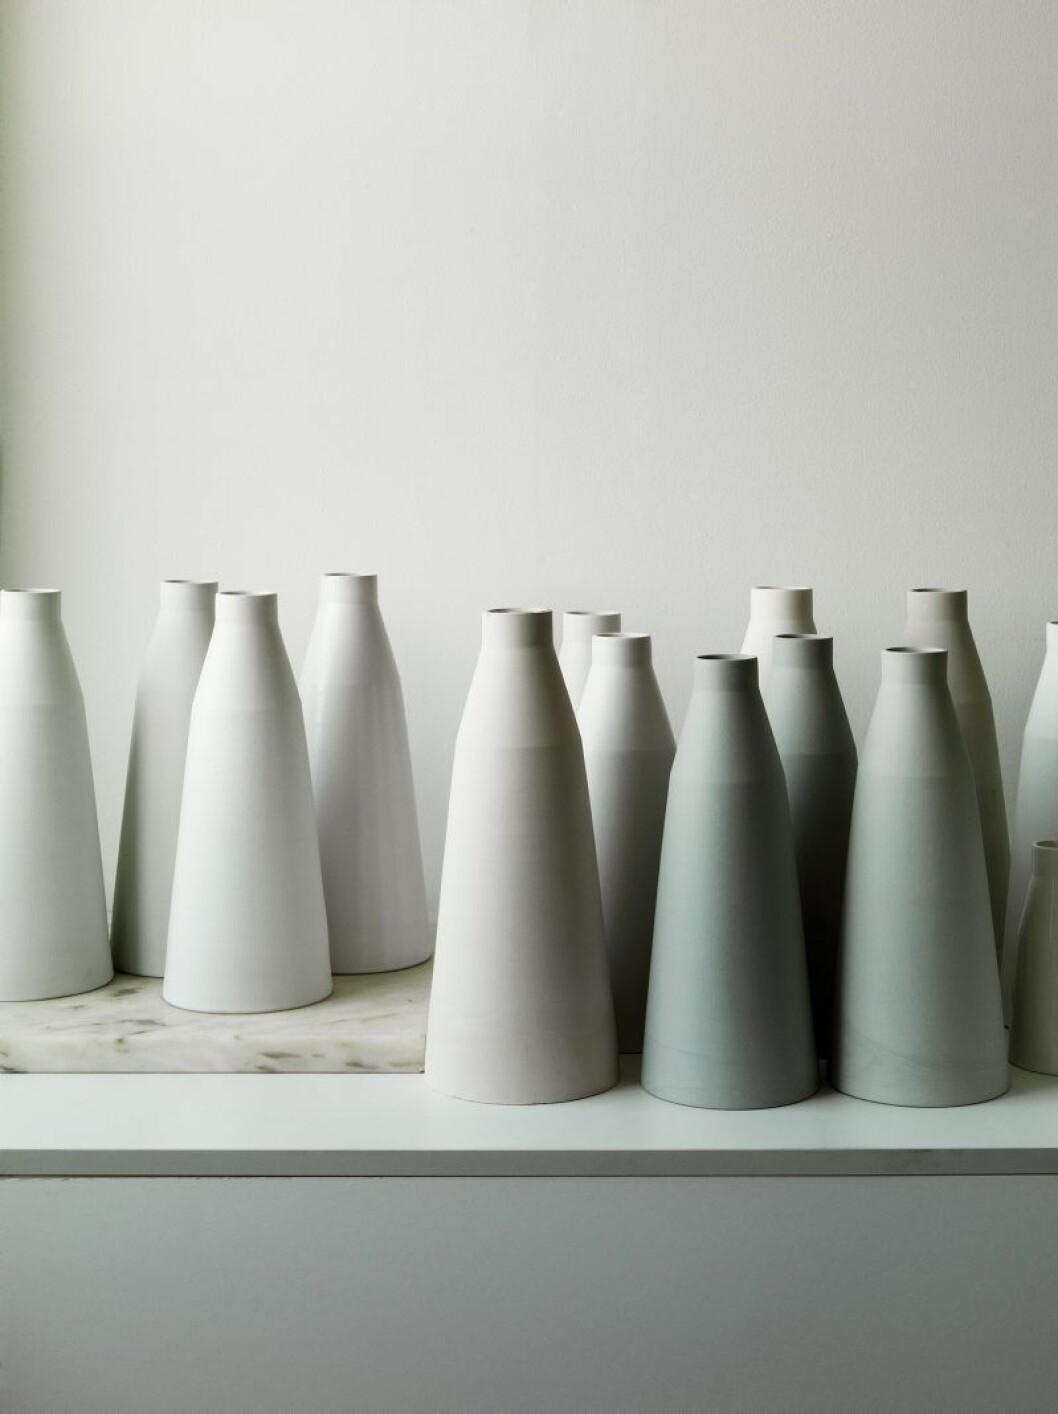 Anna Lerinder keramik foto Felix Odell7